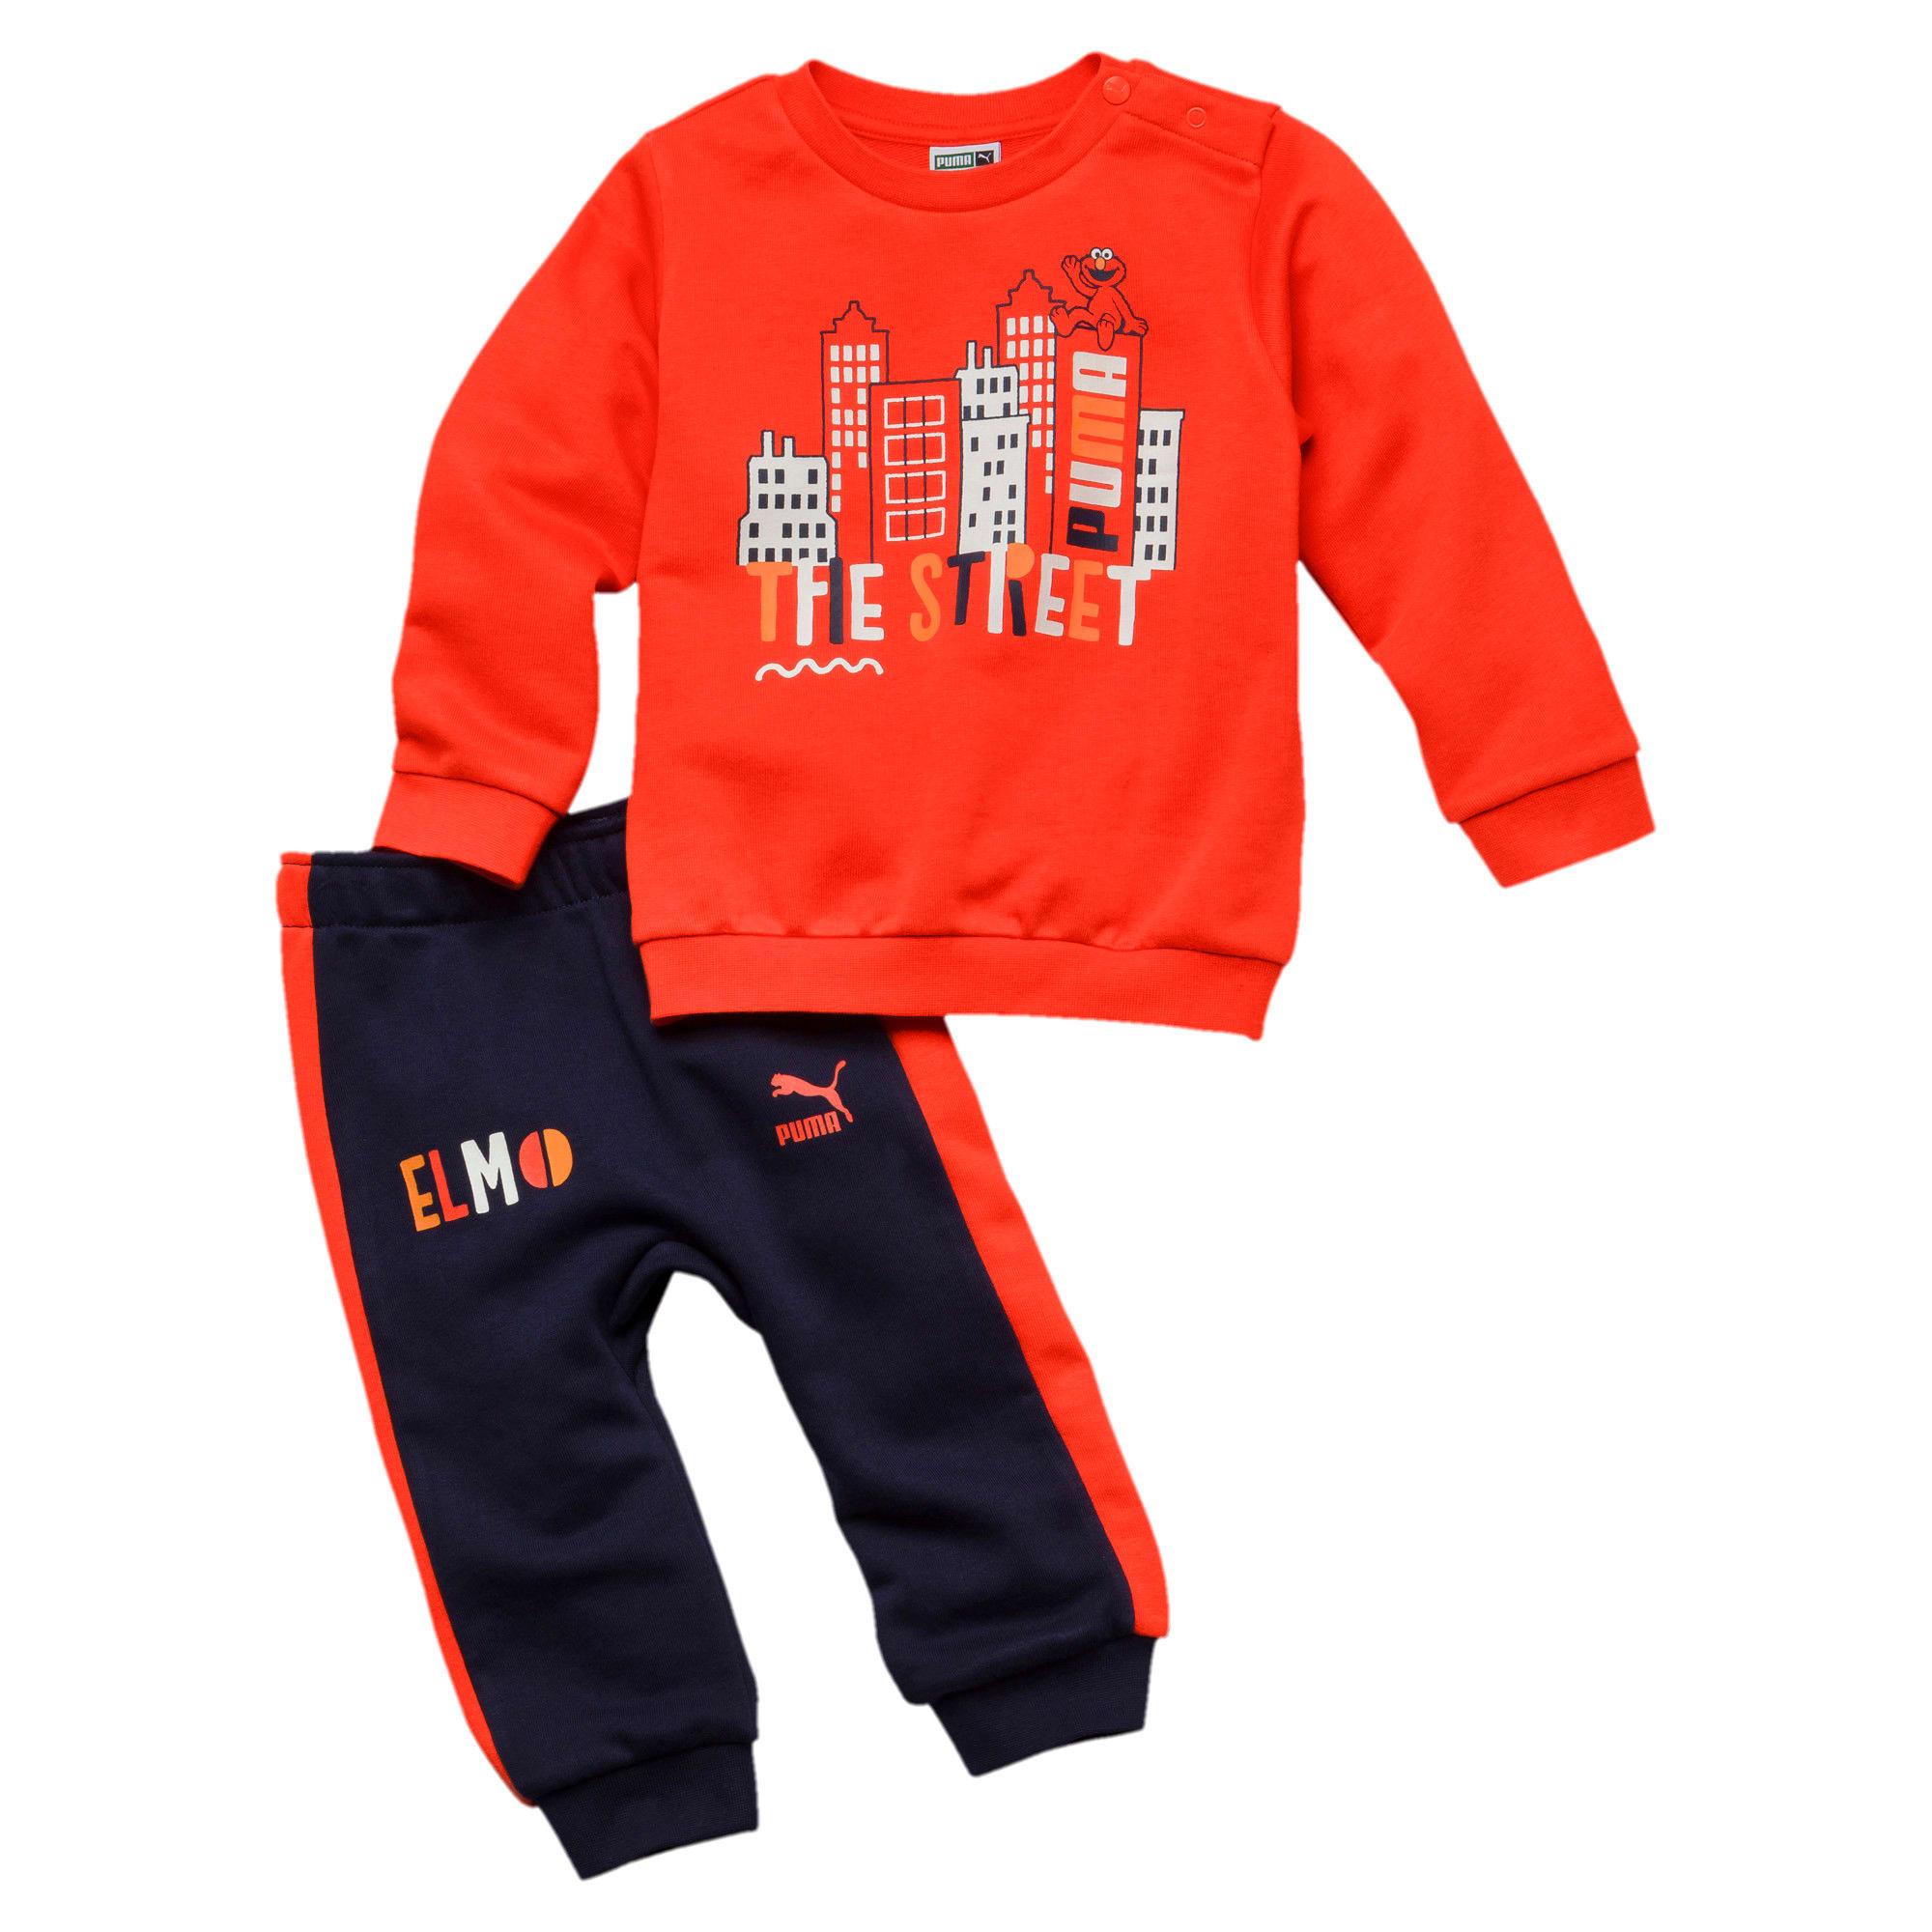 Thumbnail 1 of PUMA x SESAME STREET Infant + Toddler Crewneck Jogger Set, Cherry Tomato, medium